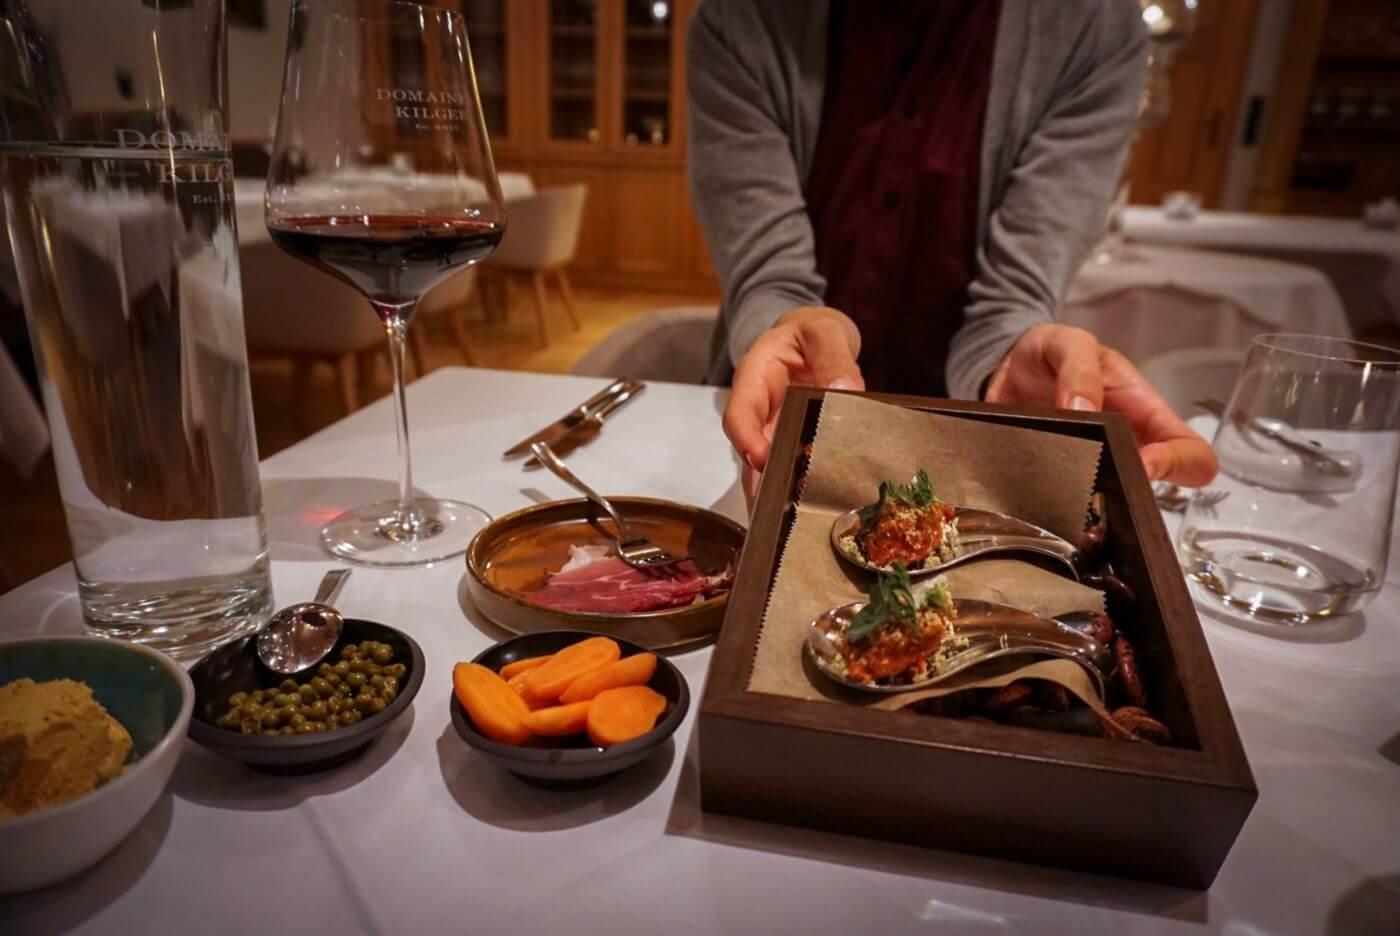 Jaglhof Tasting Menu, South Styria top restaurant, Austria